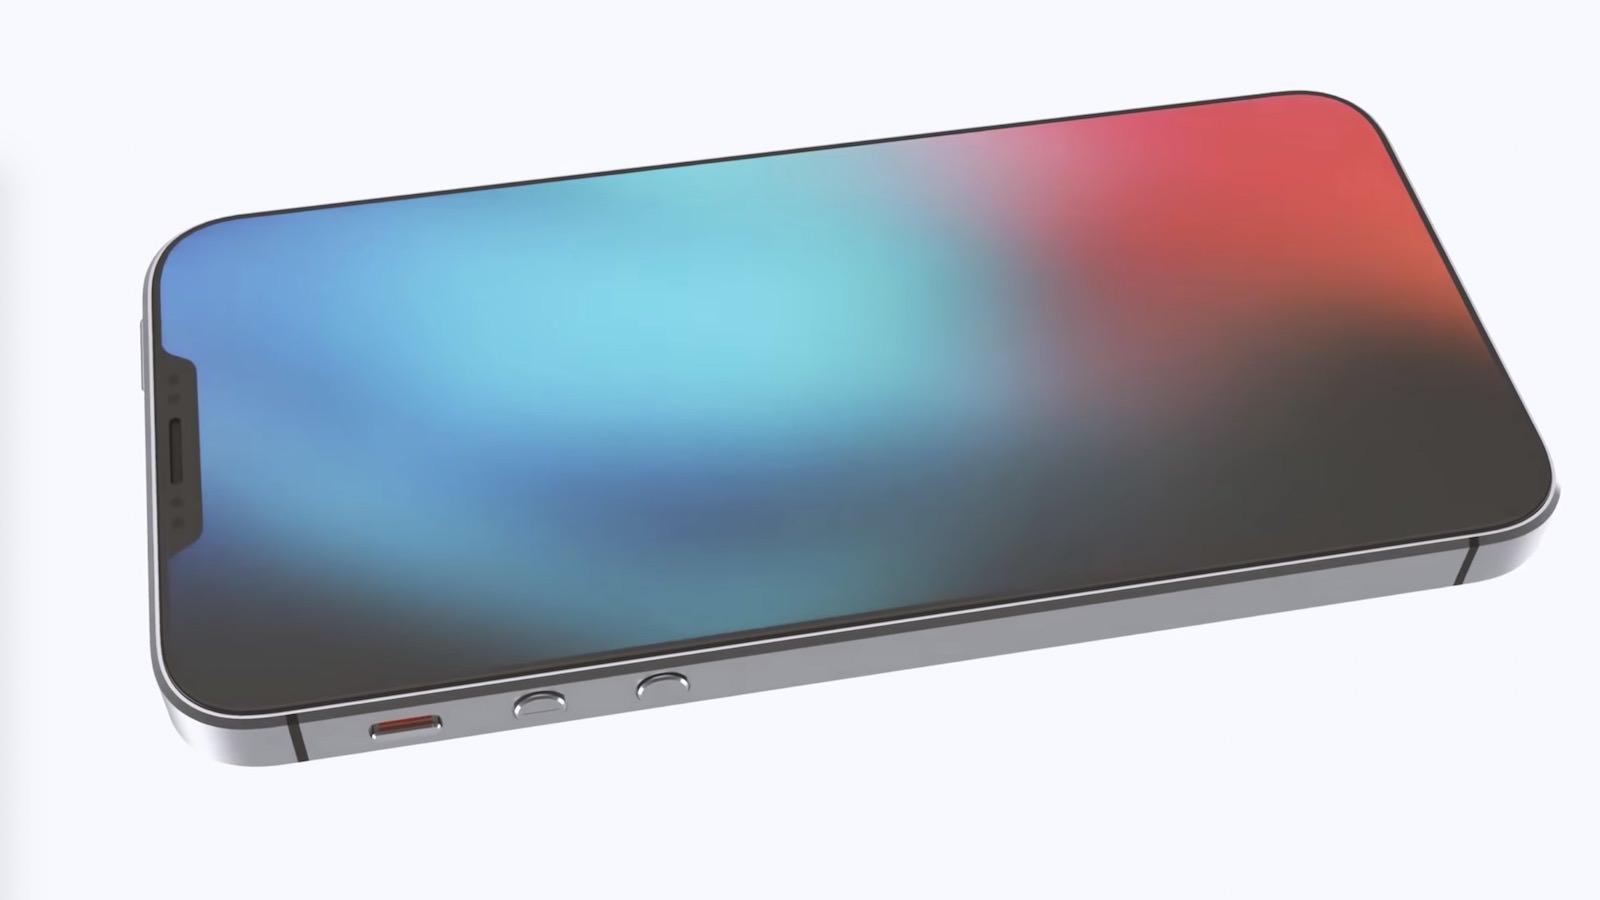 Iphone se2 concept